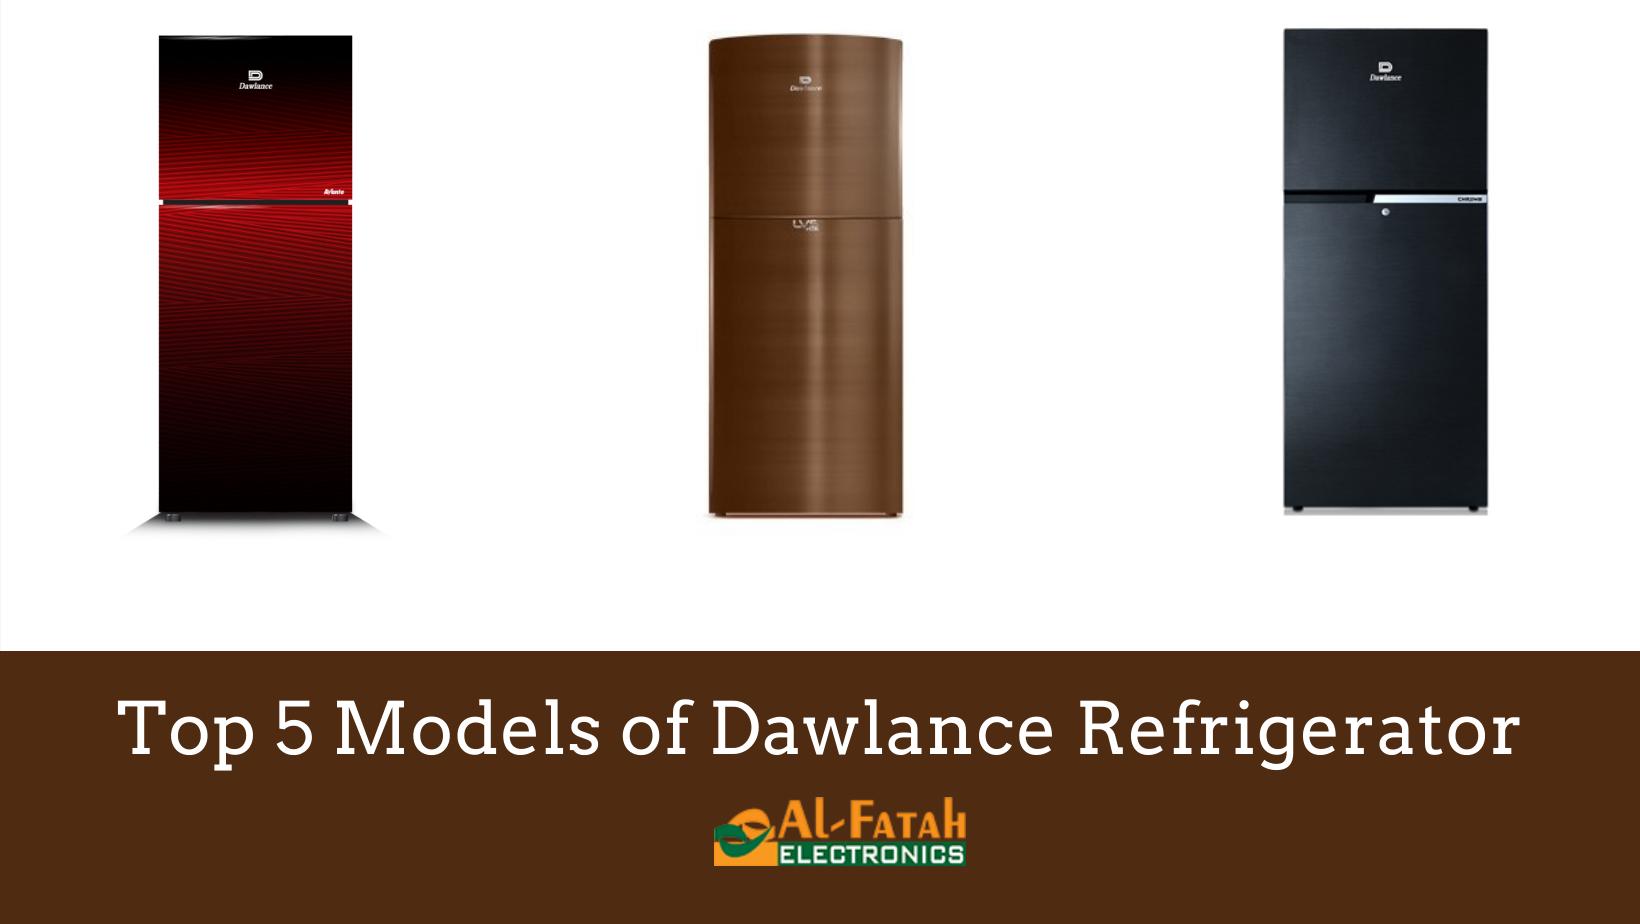 dawlance refrigerator